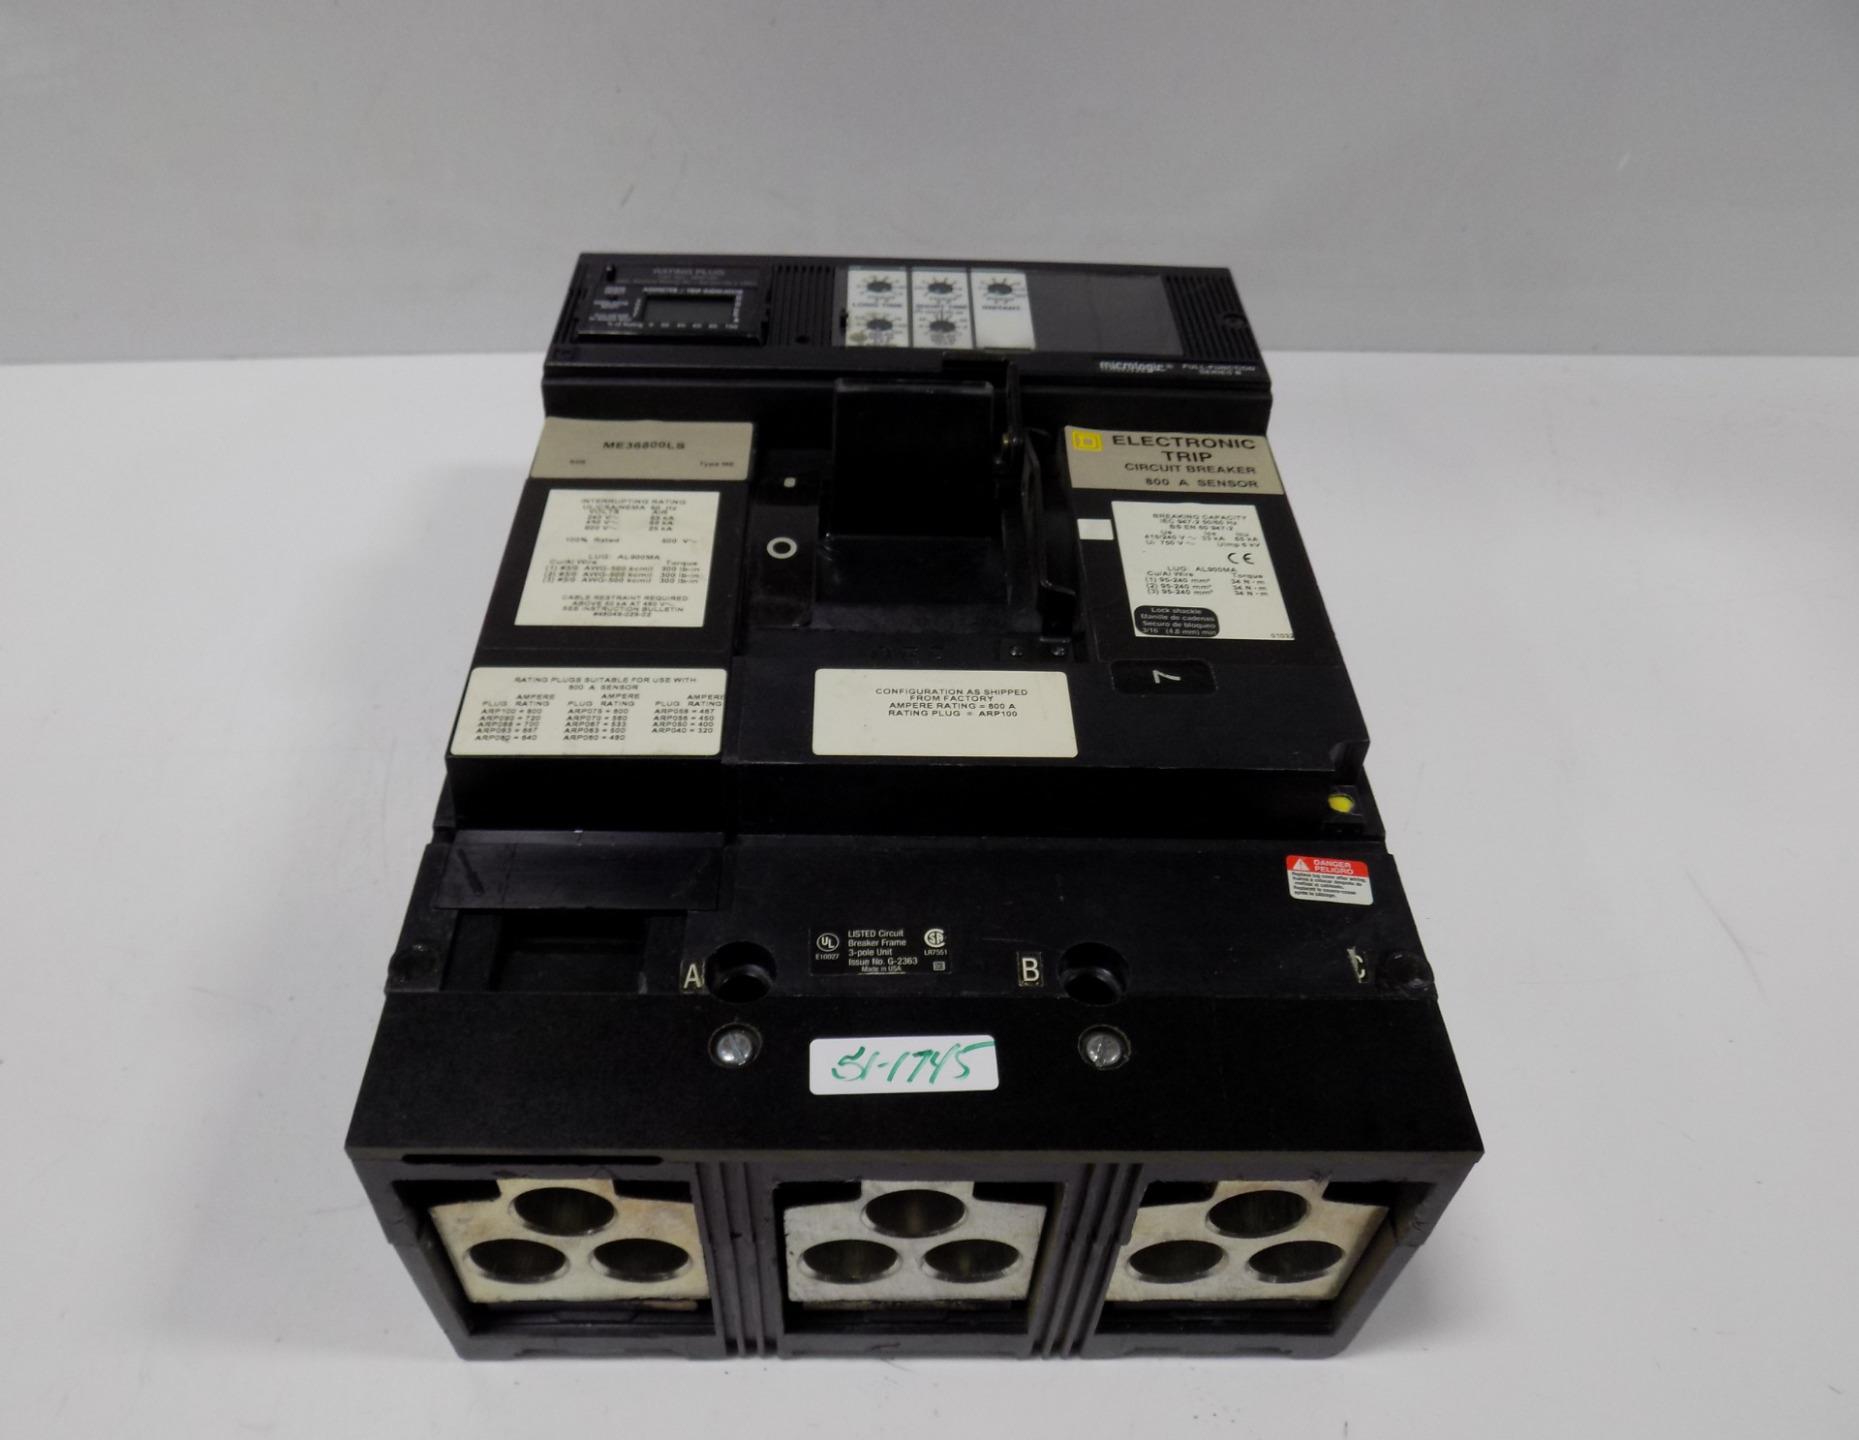 Square D 800amp Electronic Trip Circuit Breaker Me36800ls Ebay Trippingcircuitbreakerpaneljpg